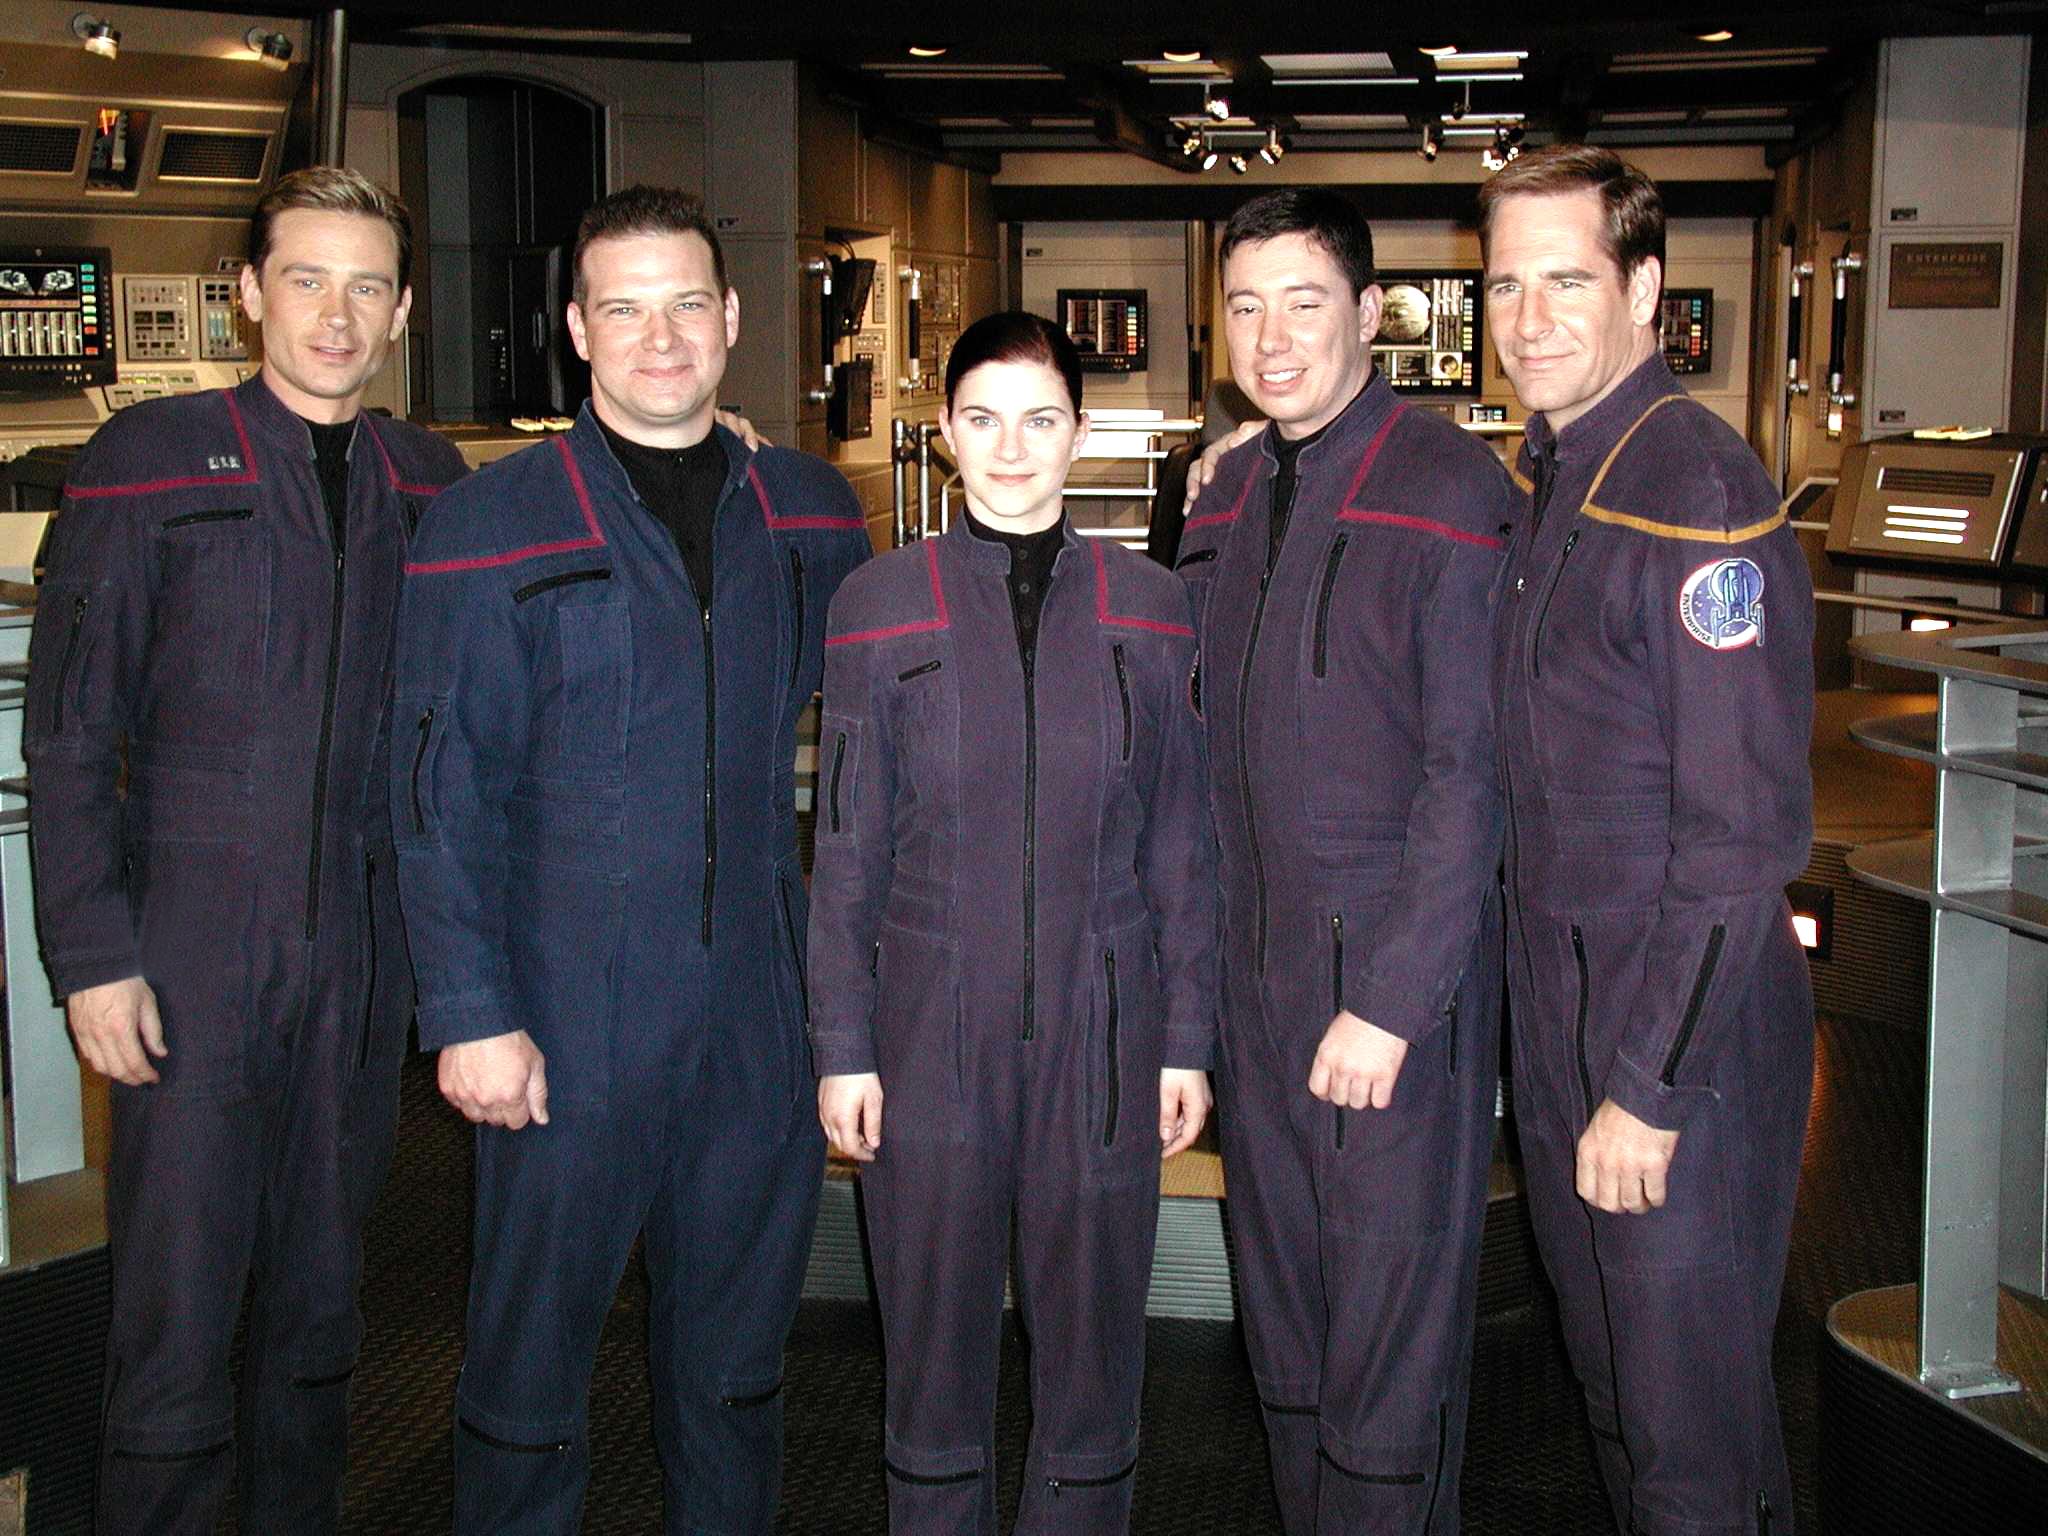 Enterprise Fans meet cast members